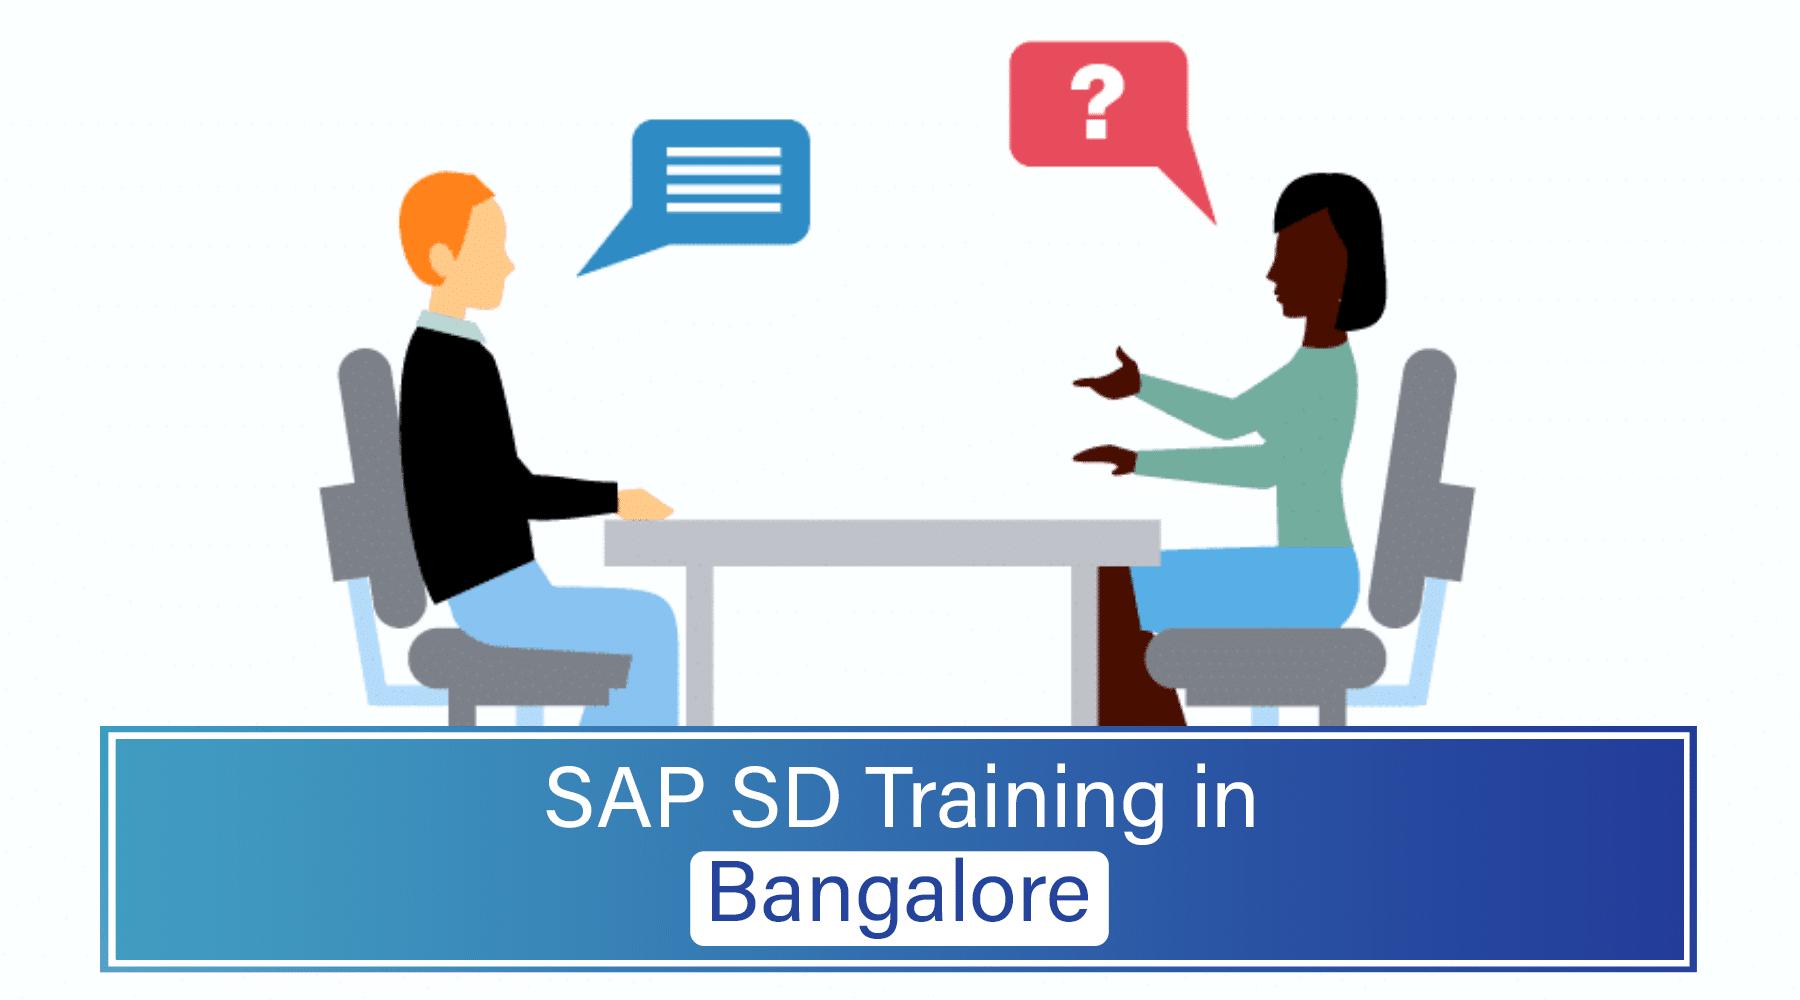 SAP SD Training in Bangalore